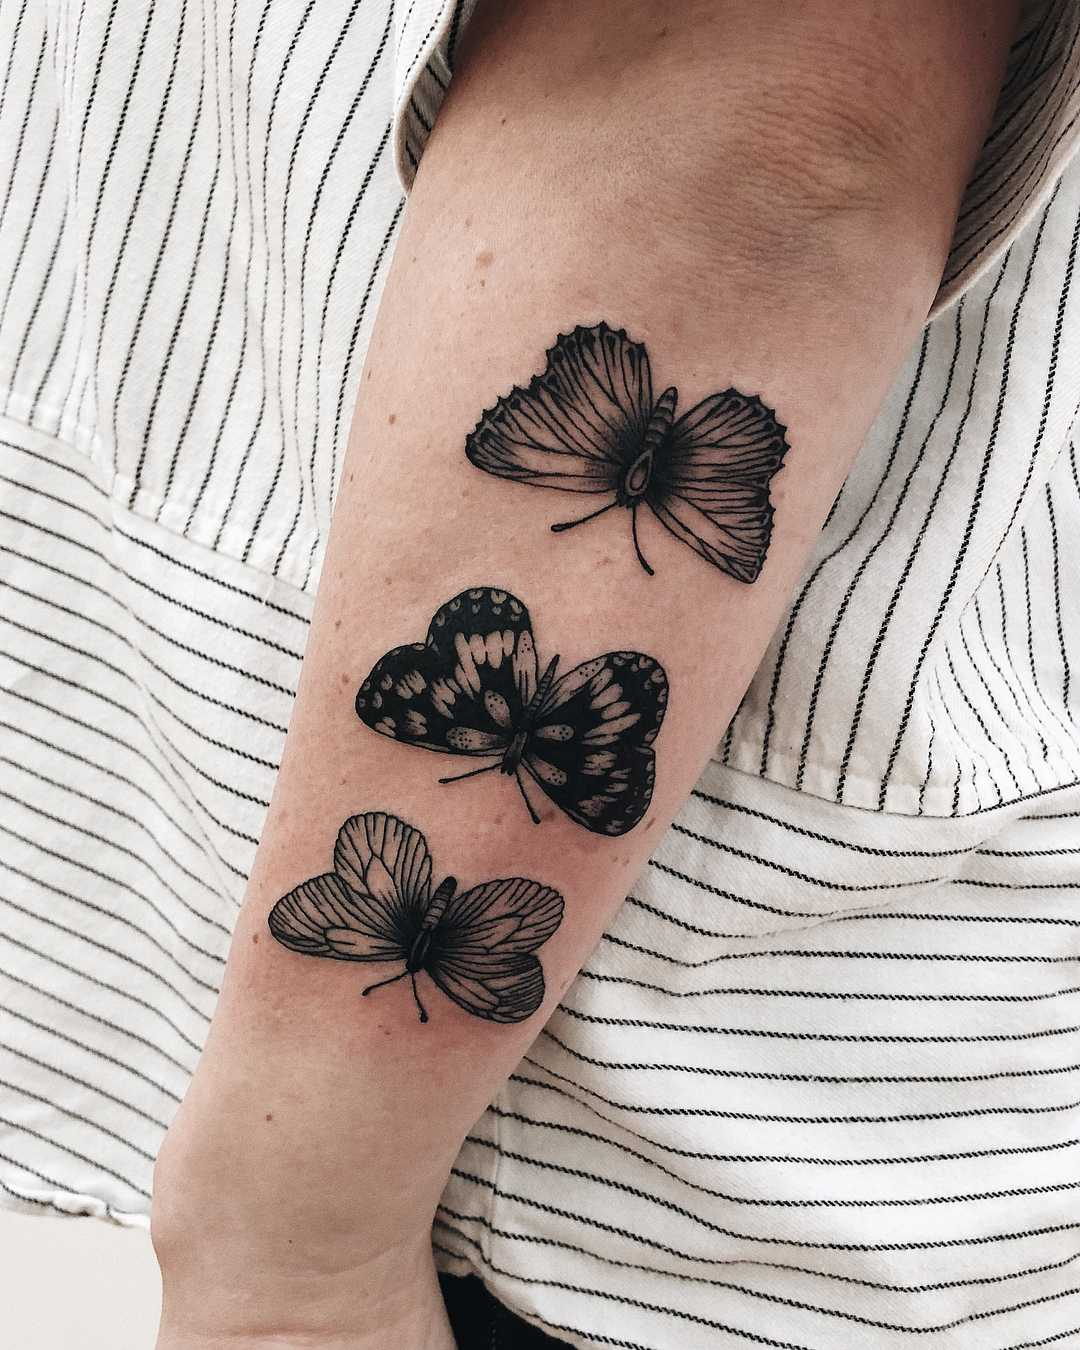 Three butterfly tattoos by Finley Jordan